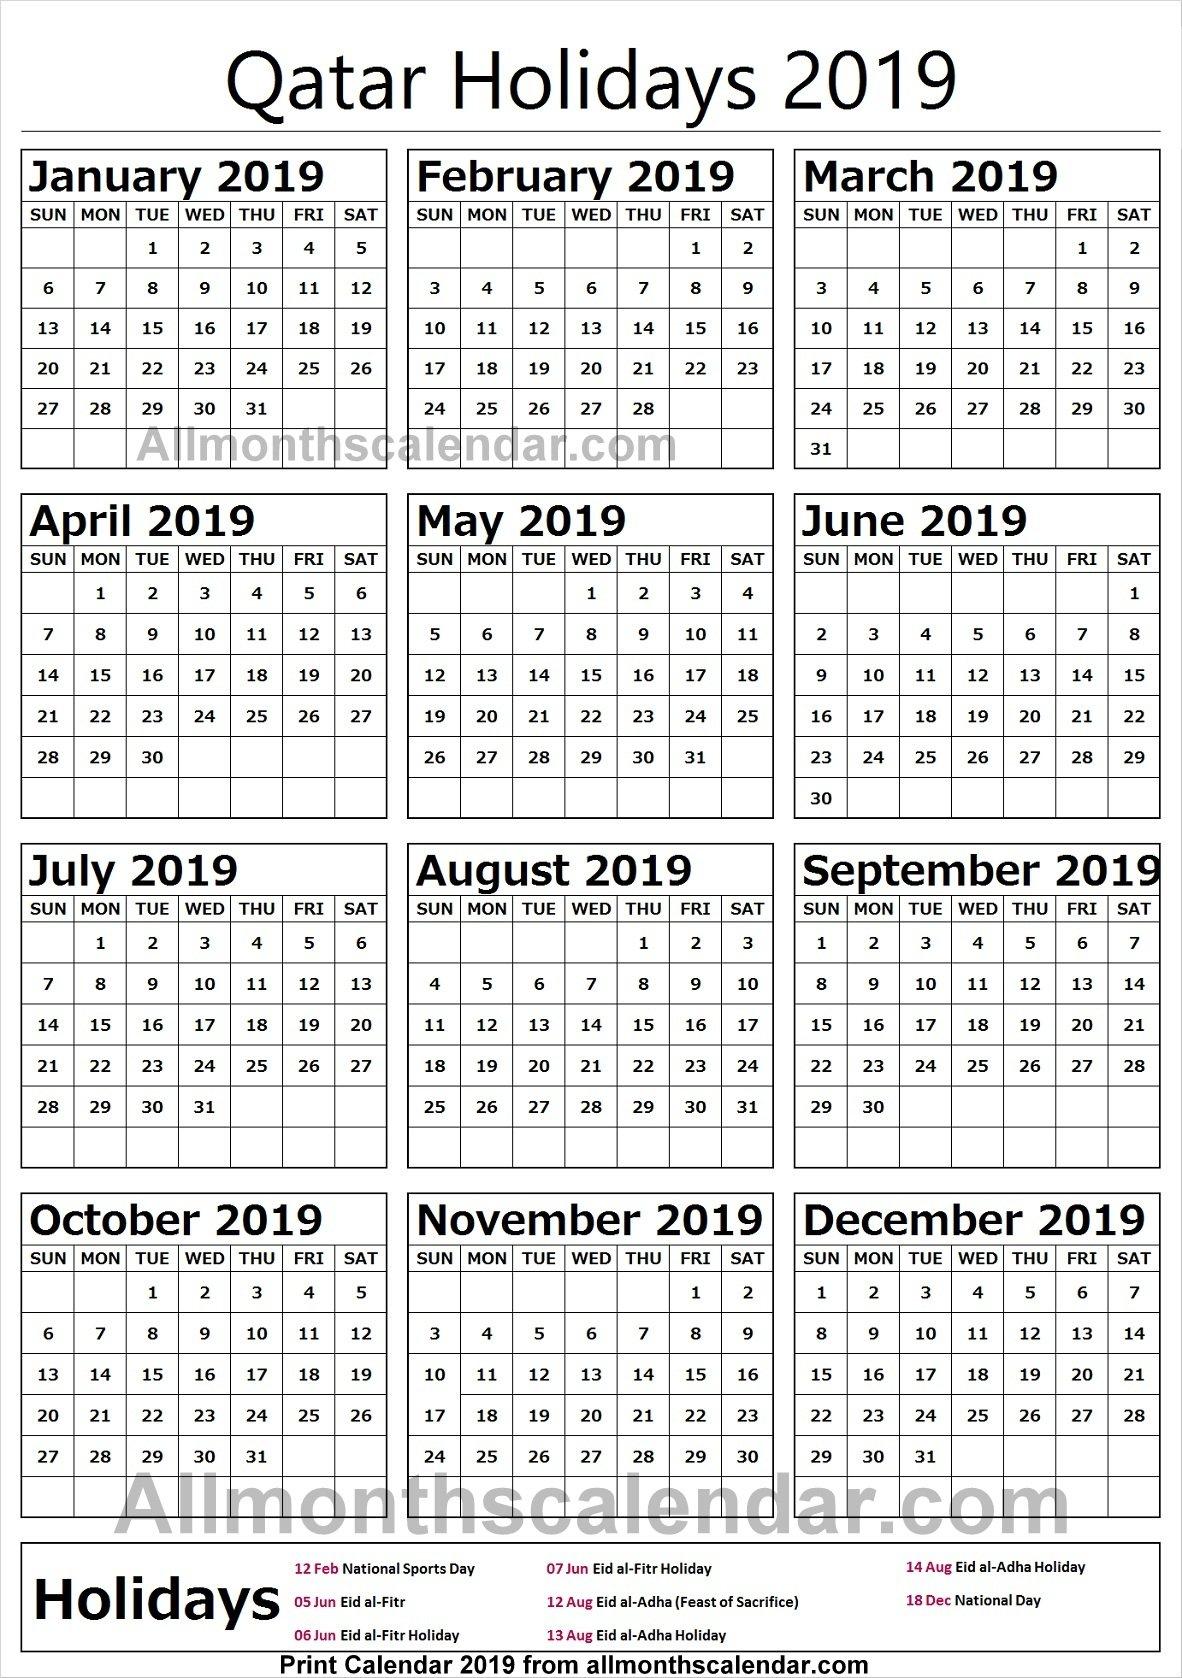 Qatar Holiday List 2019 Calendar | 2019 Qatar Calendar Templates Calendar 2019 Qatar